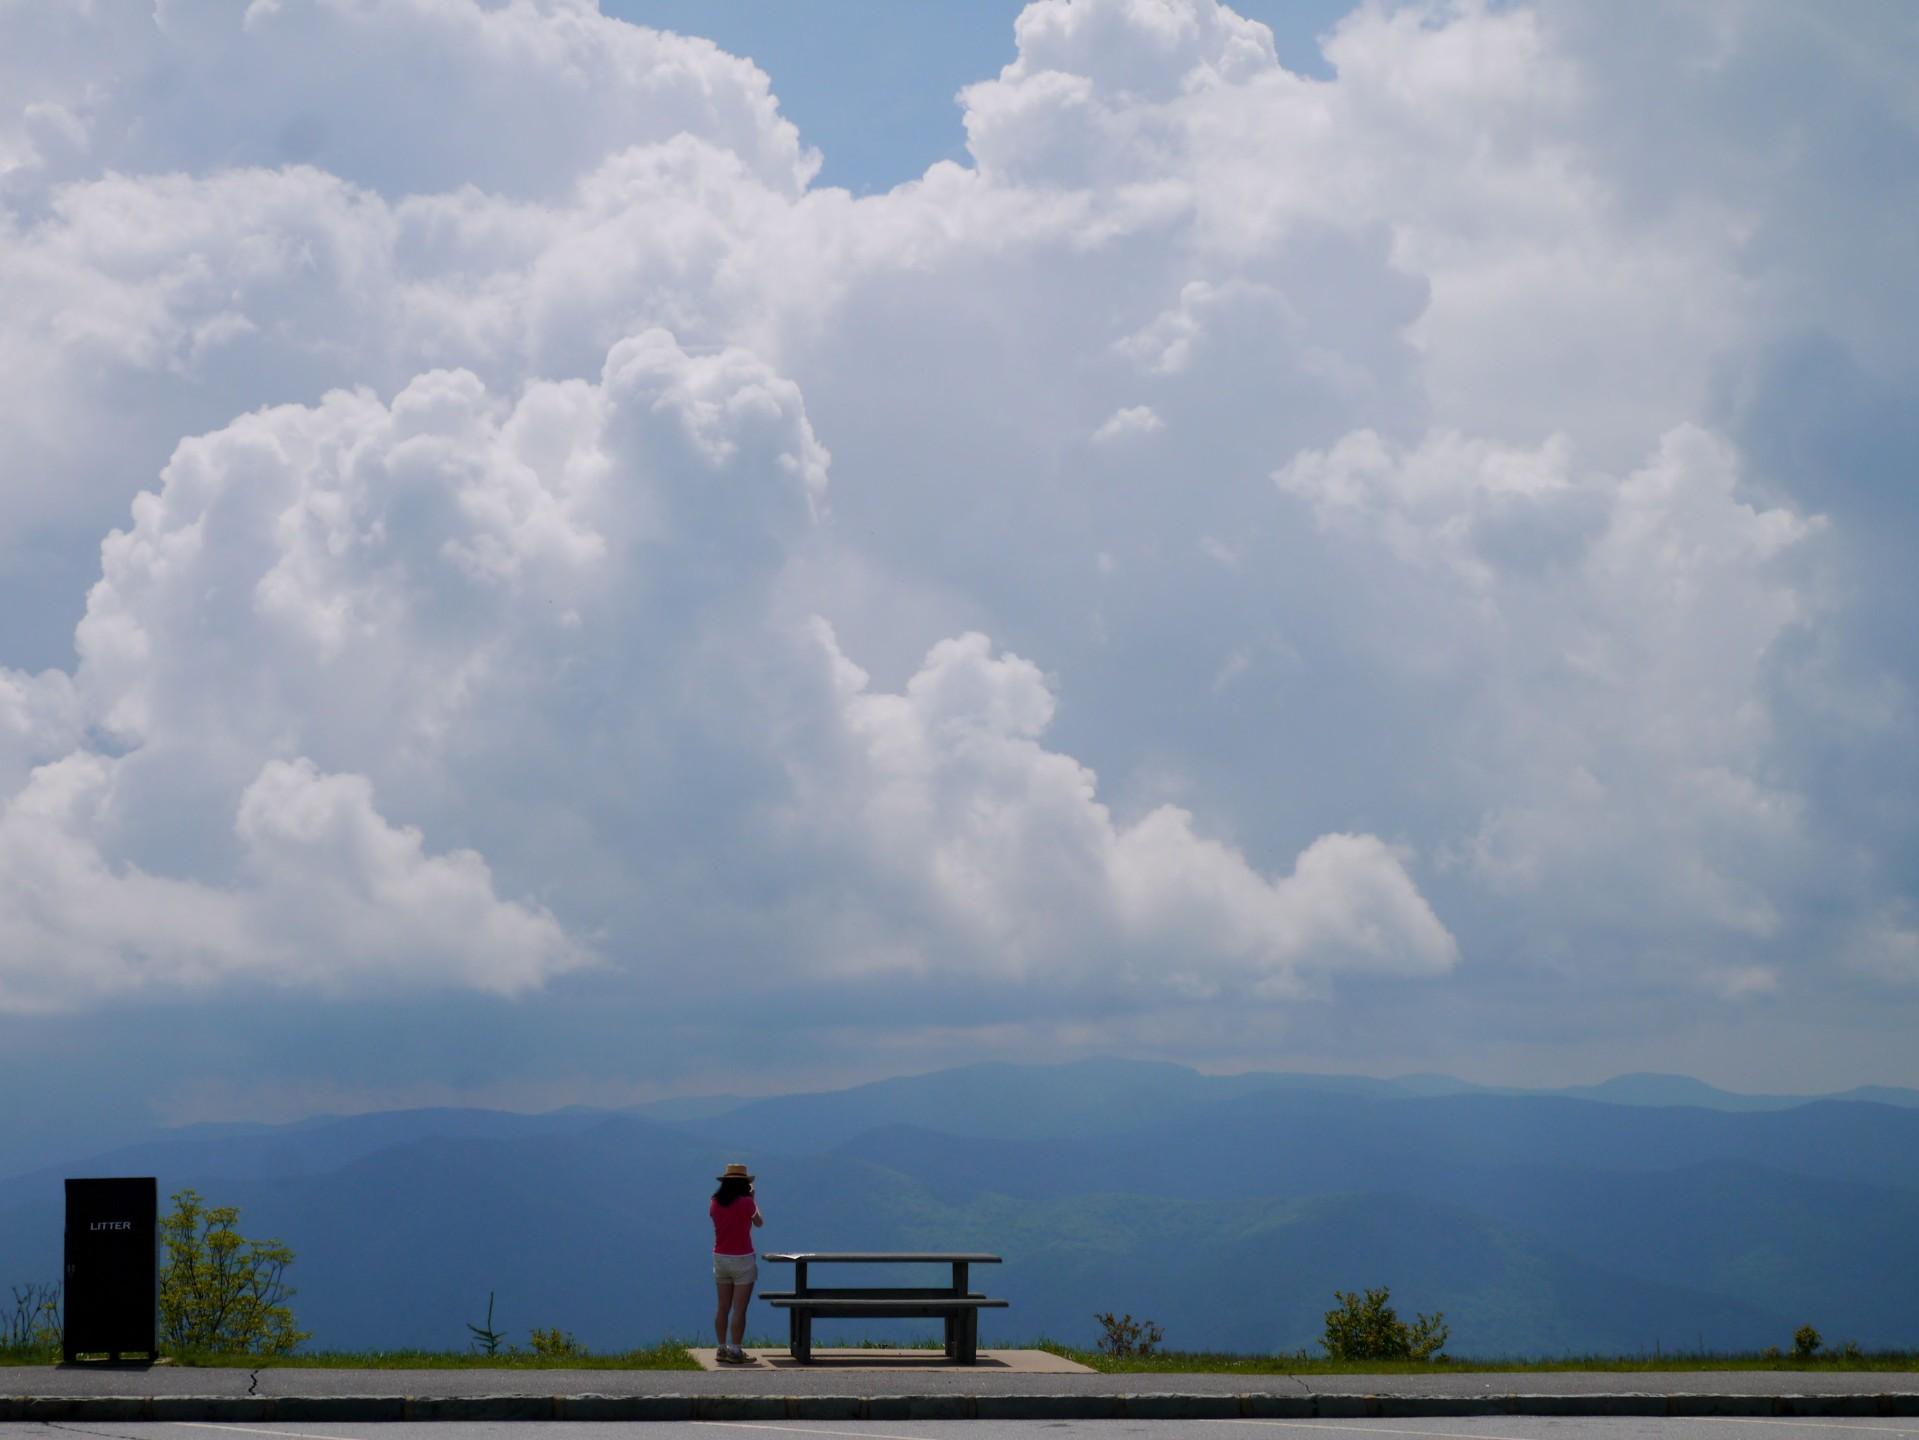 waterrock knob, nature, north carolina, landscape, mountains